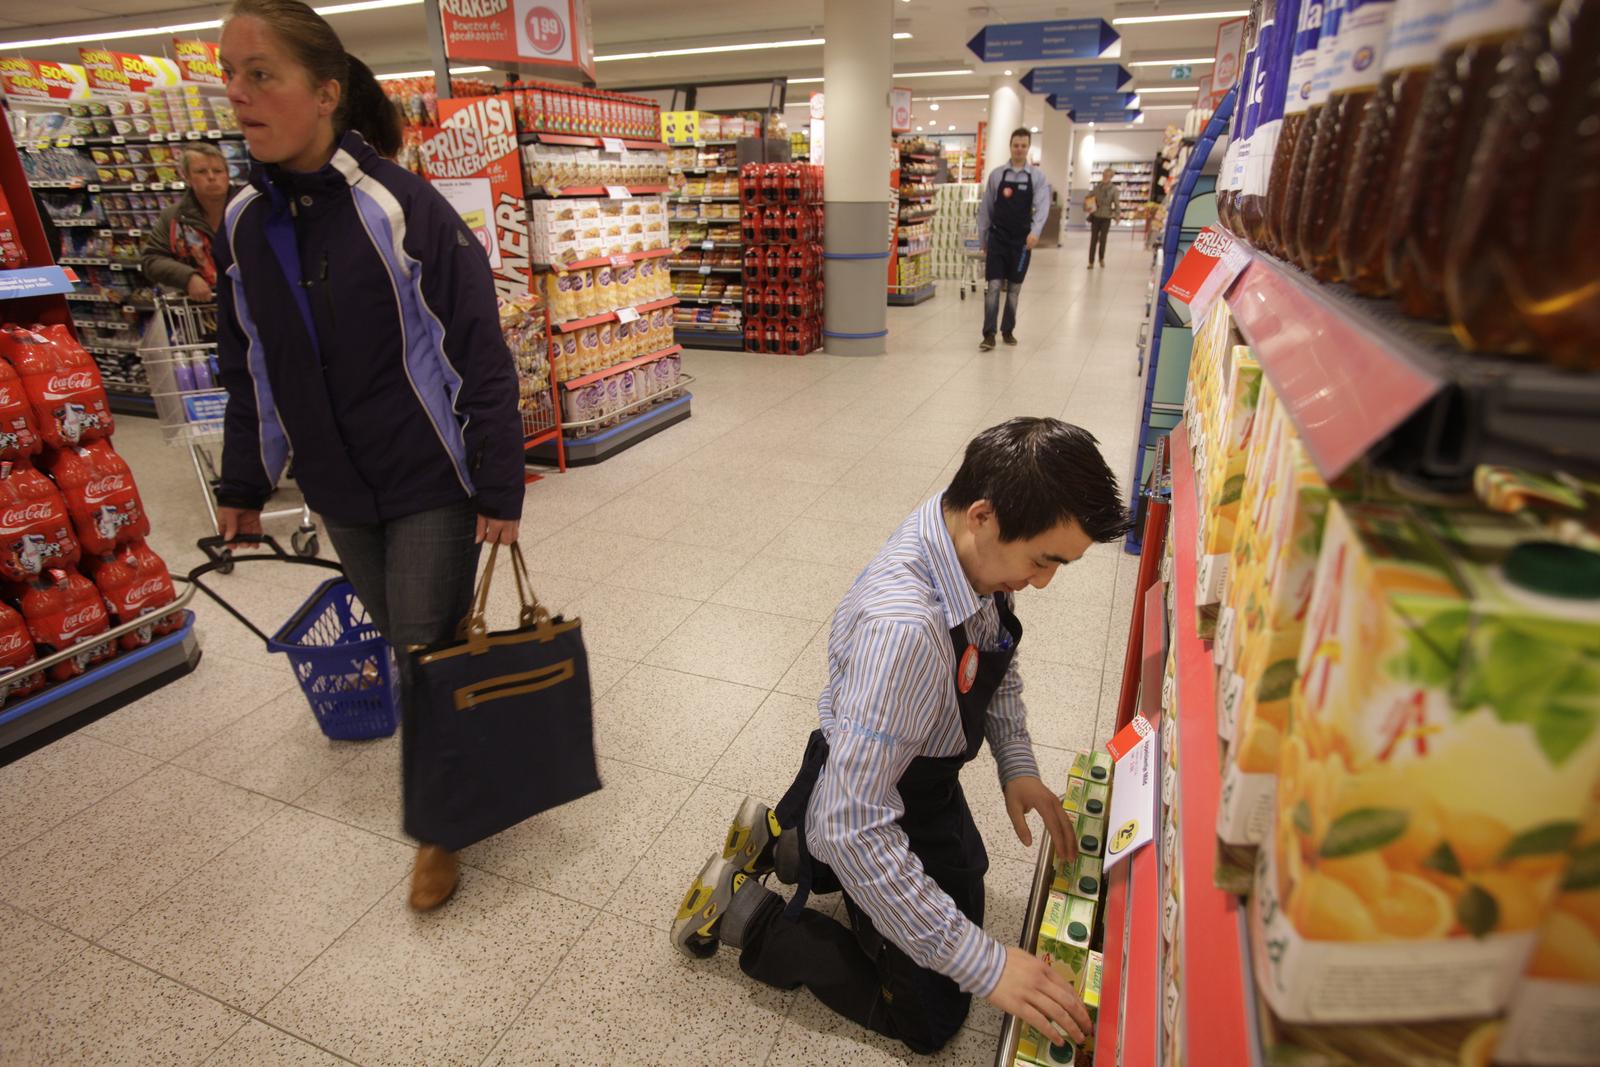 VVD wil werklozen als vakkenvullers